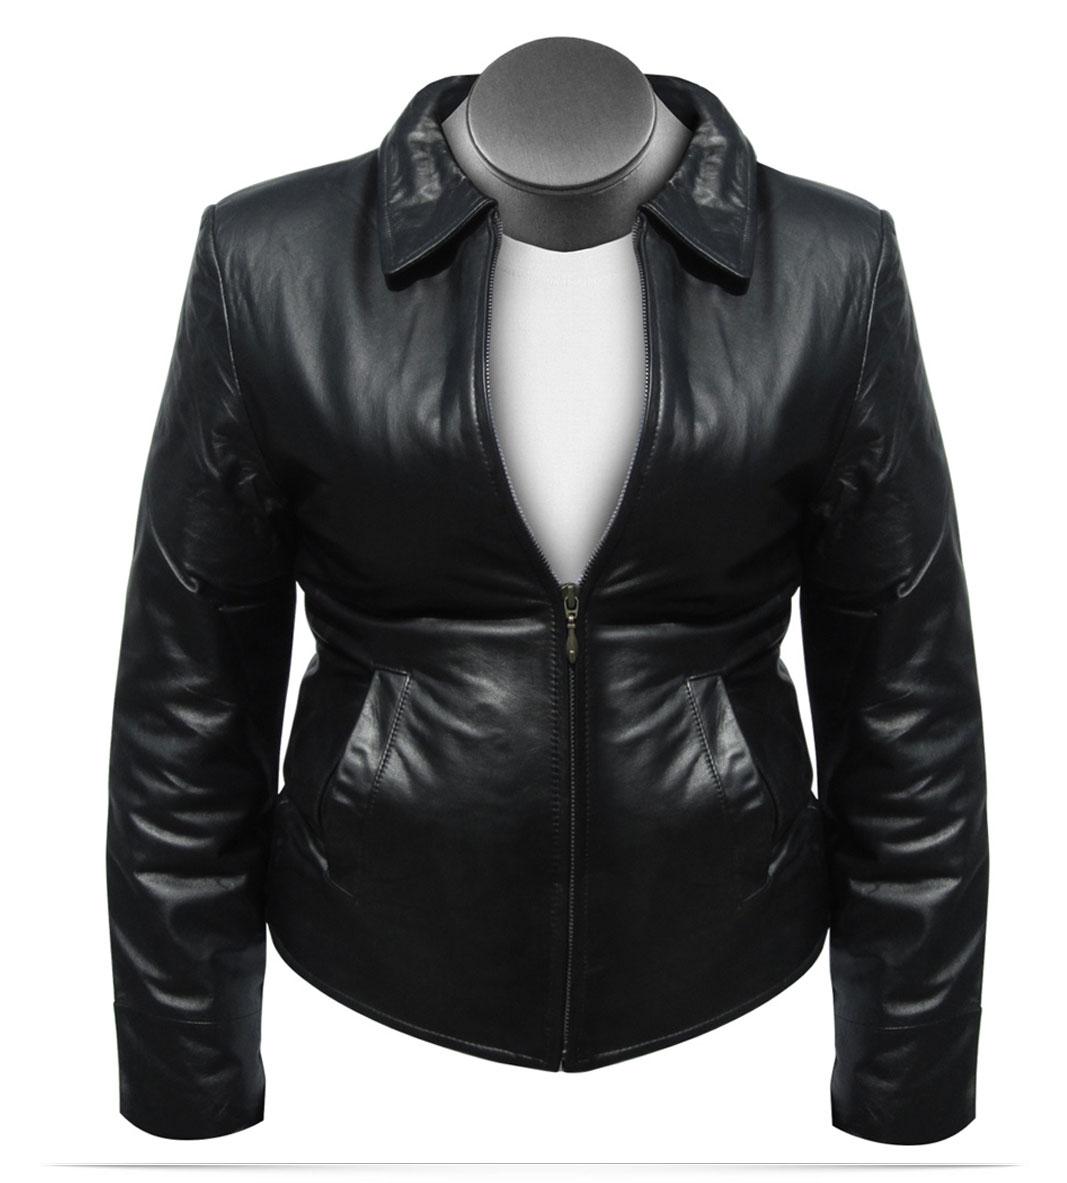 Customize Ladies Hornet Leather Jacket